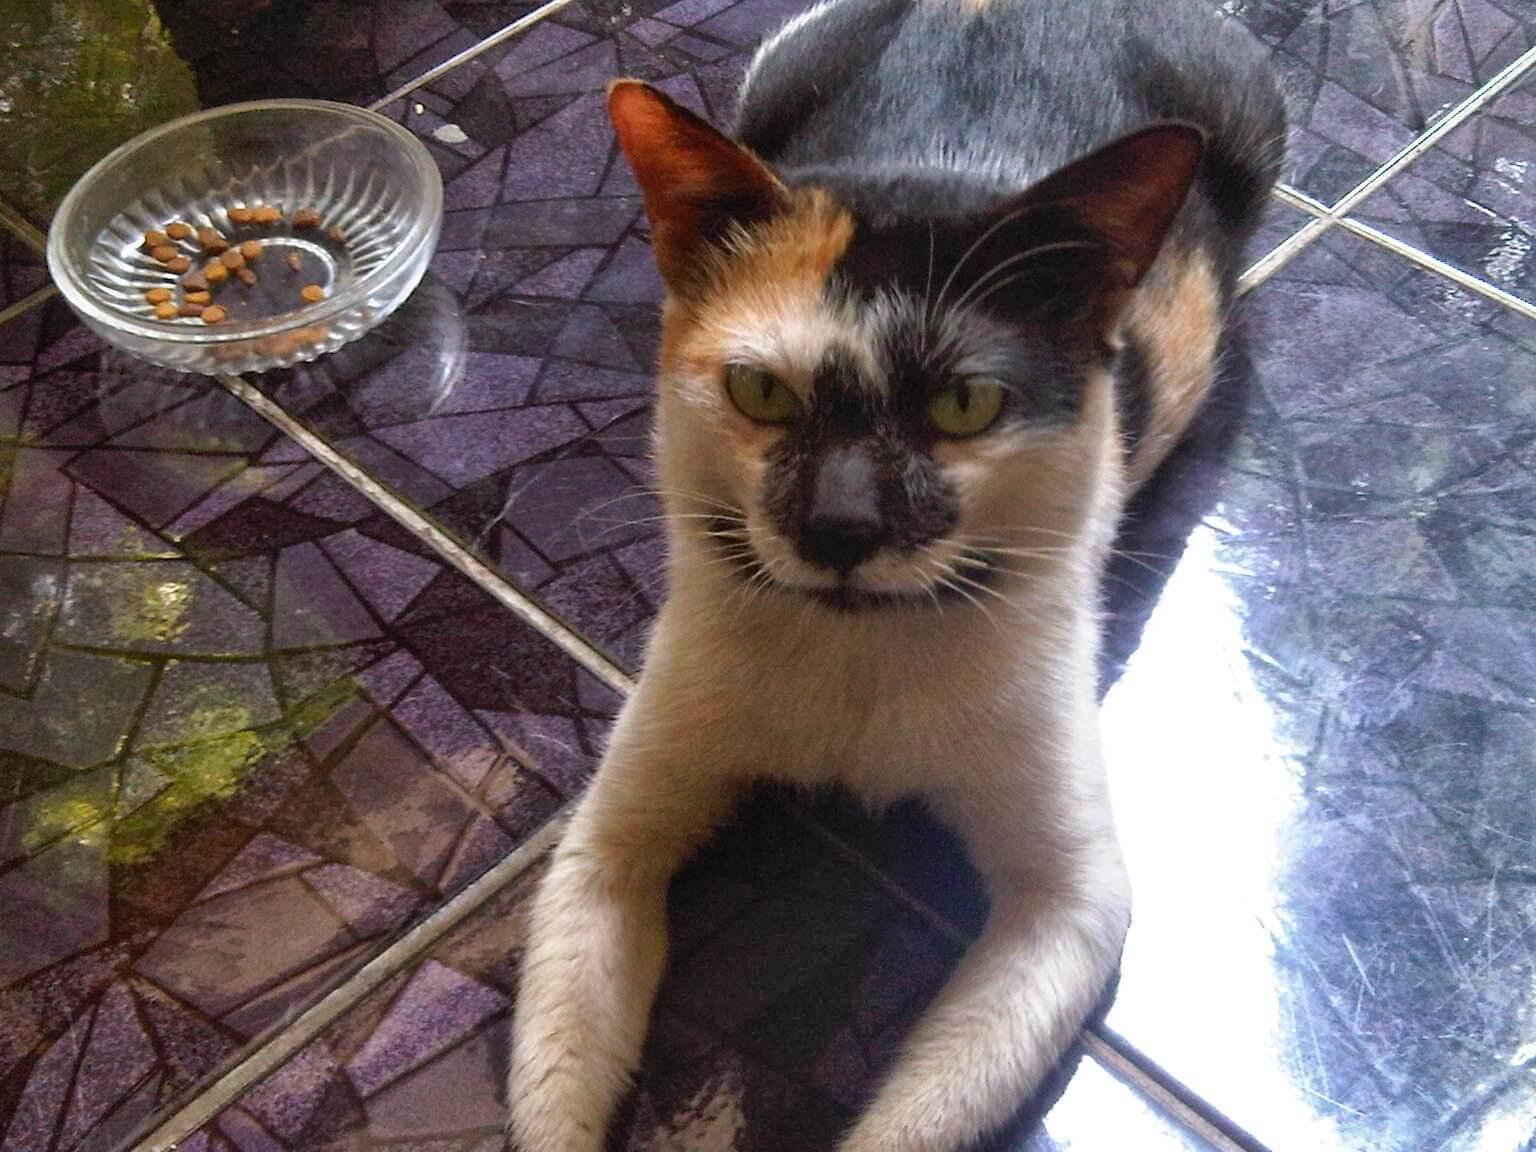 kucing kembang telon bukanlah kucing ras